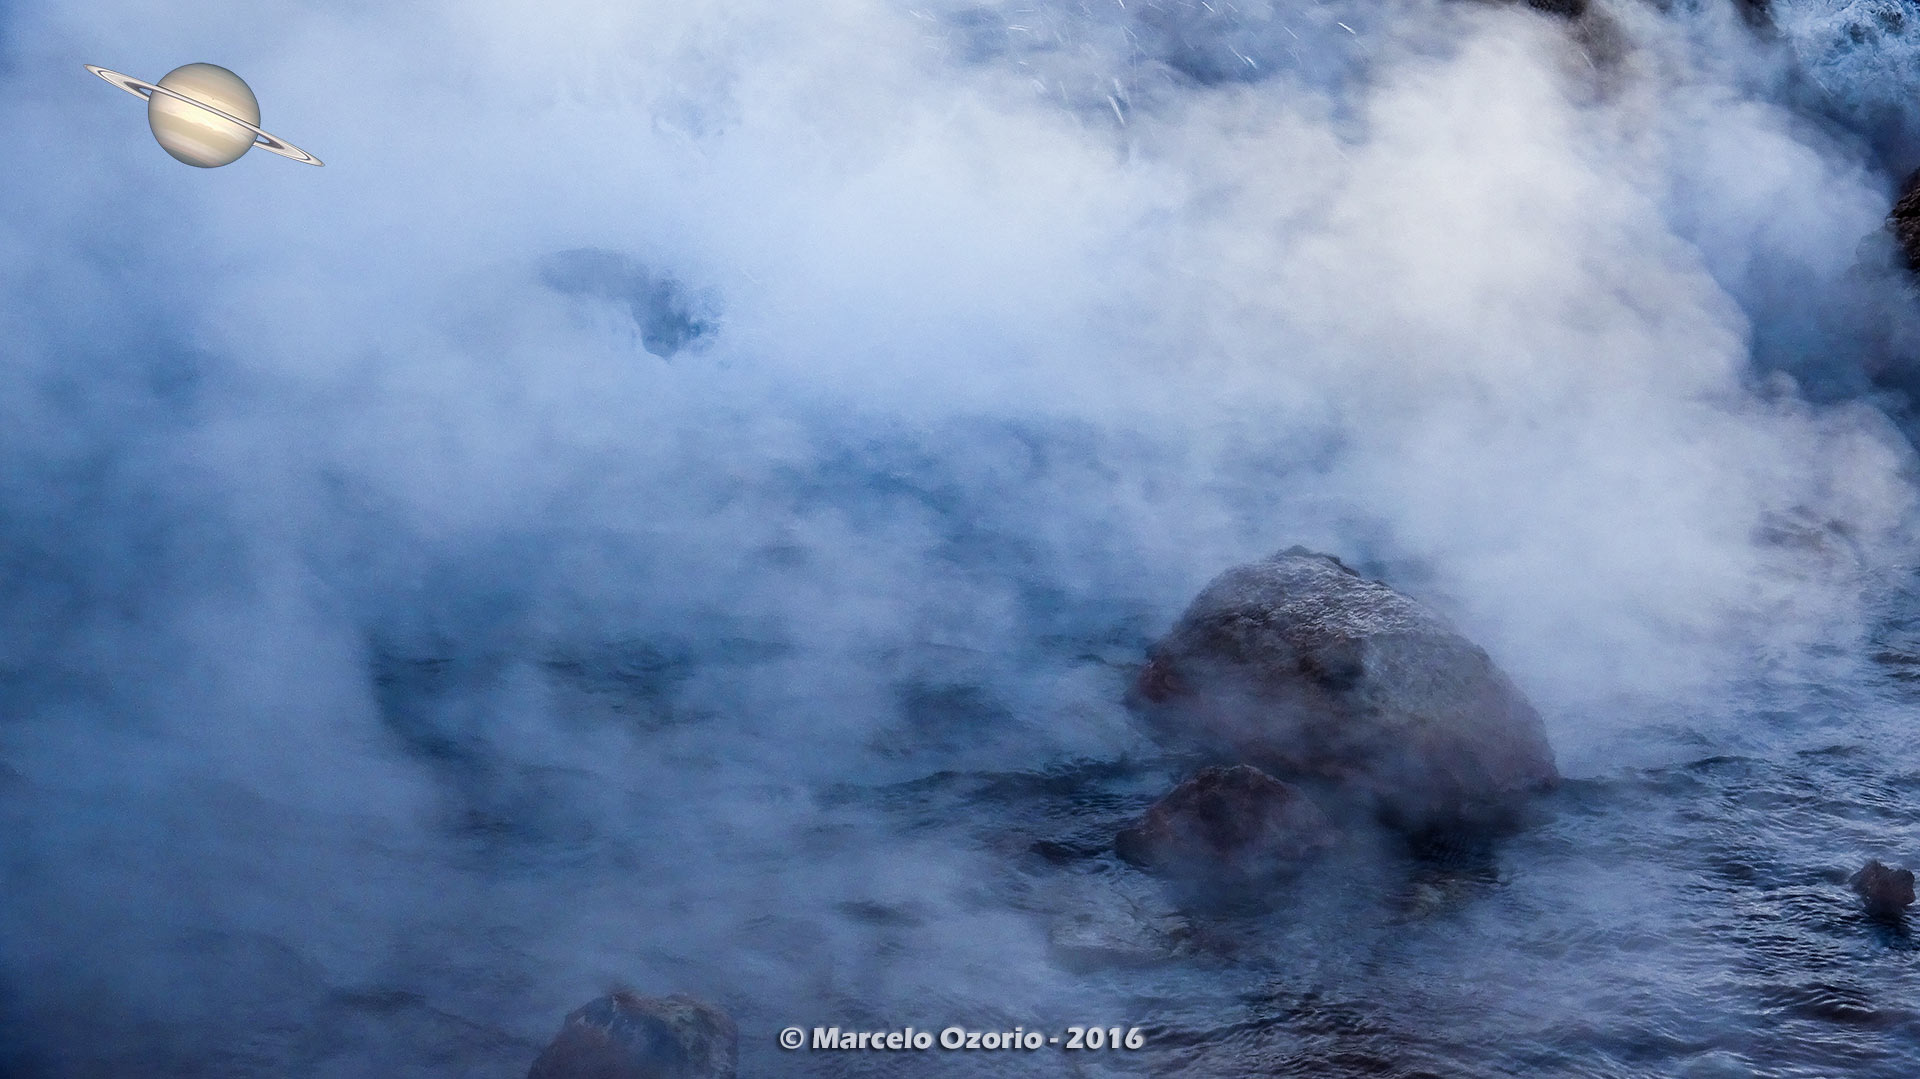 el tatio geysers atacama desert 5 - Os Surreais Gêiseres El Tatio - Deserto do Atacama - Chile